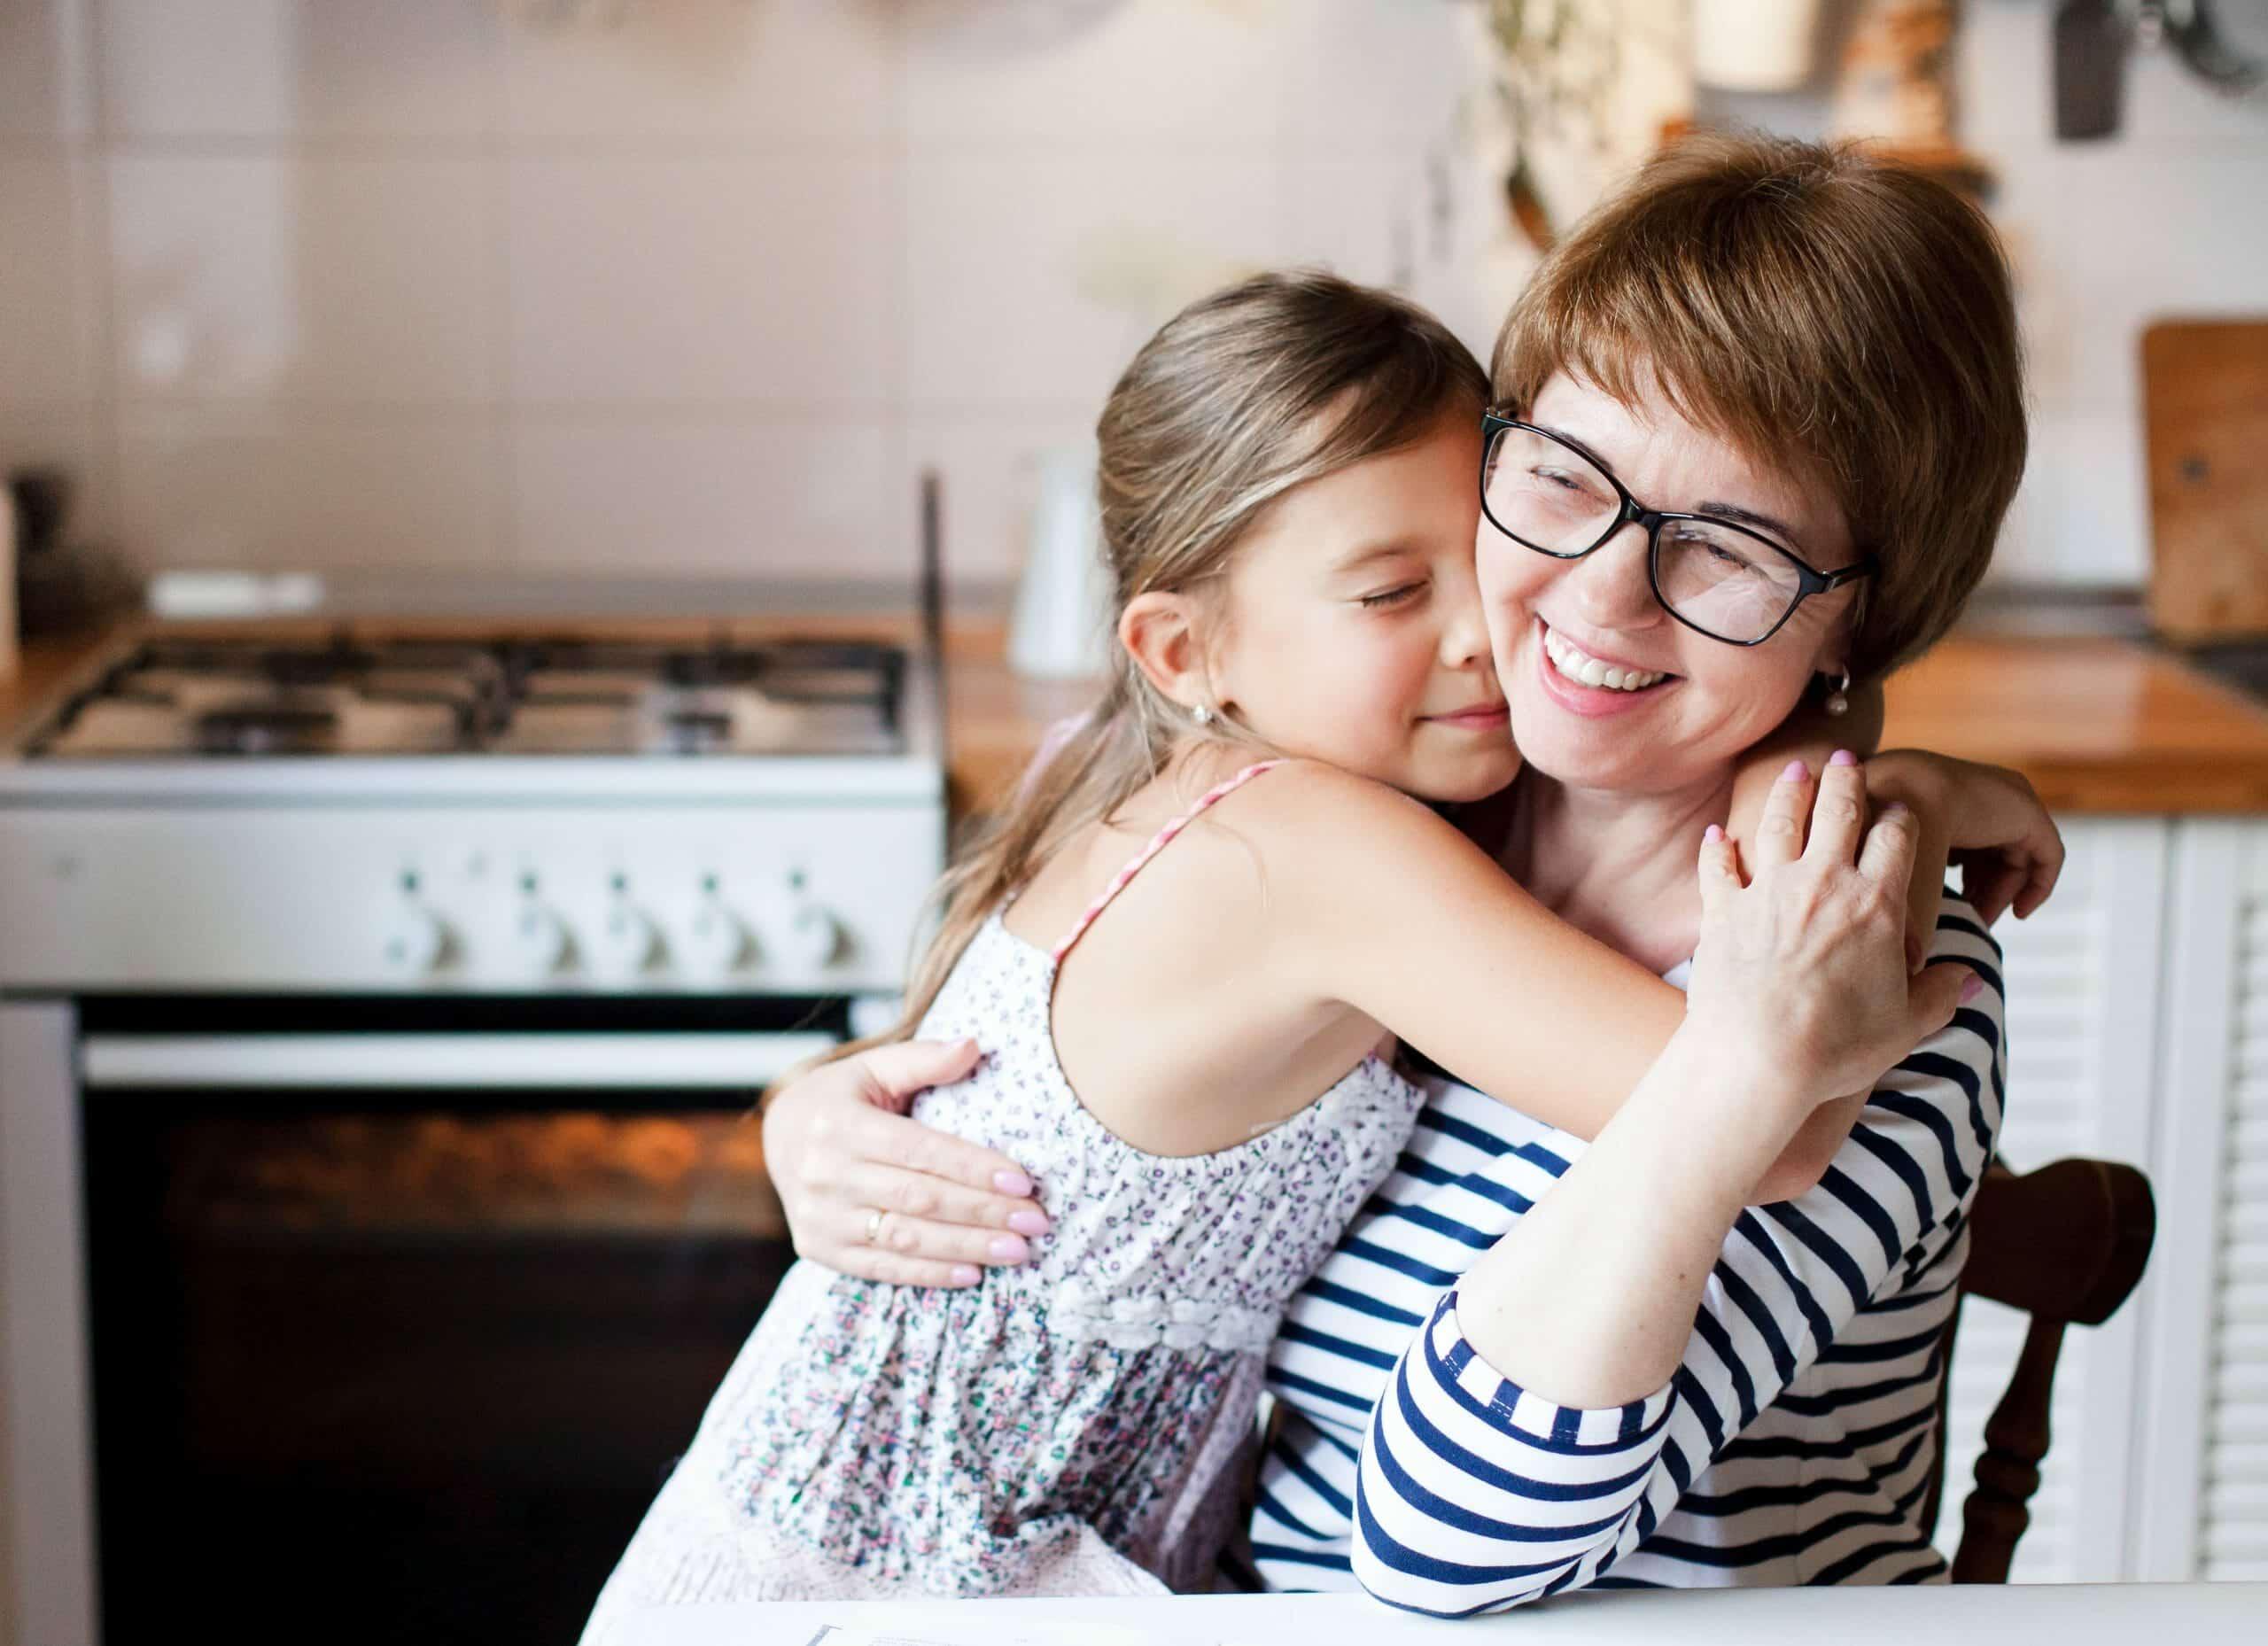 Ouderbetrokkenheid: wat kan ik als ouder doen?